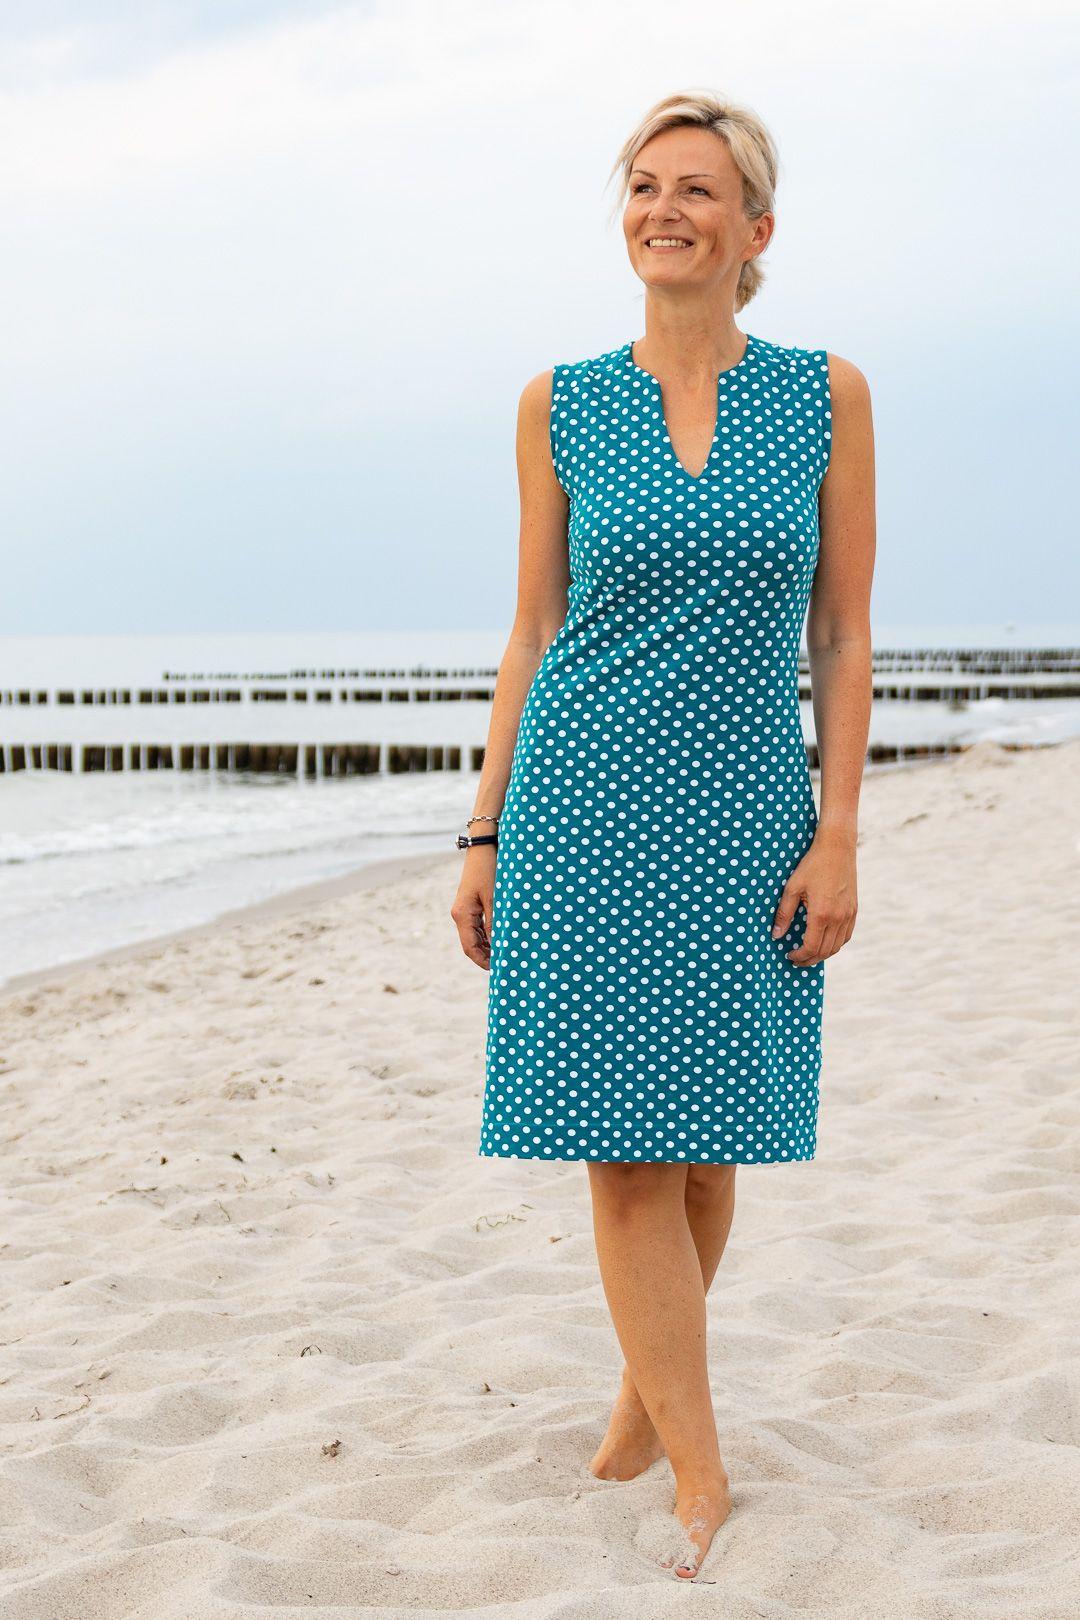 Neue Schnittmuster: Kleid Kilia, Maxikleid Milia und Shirt